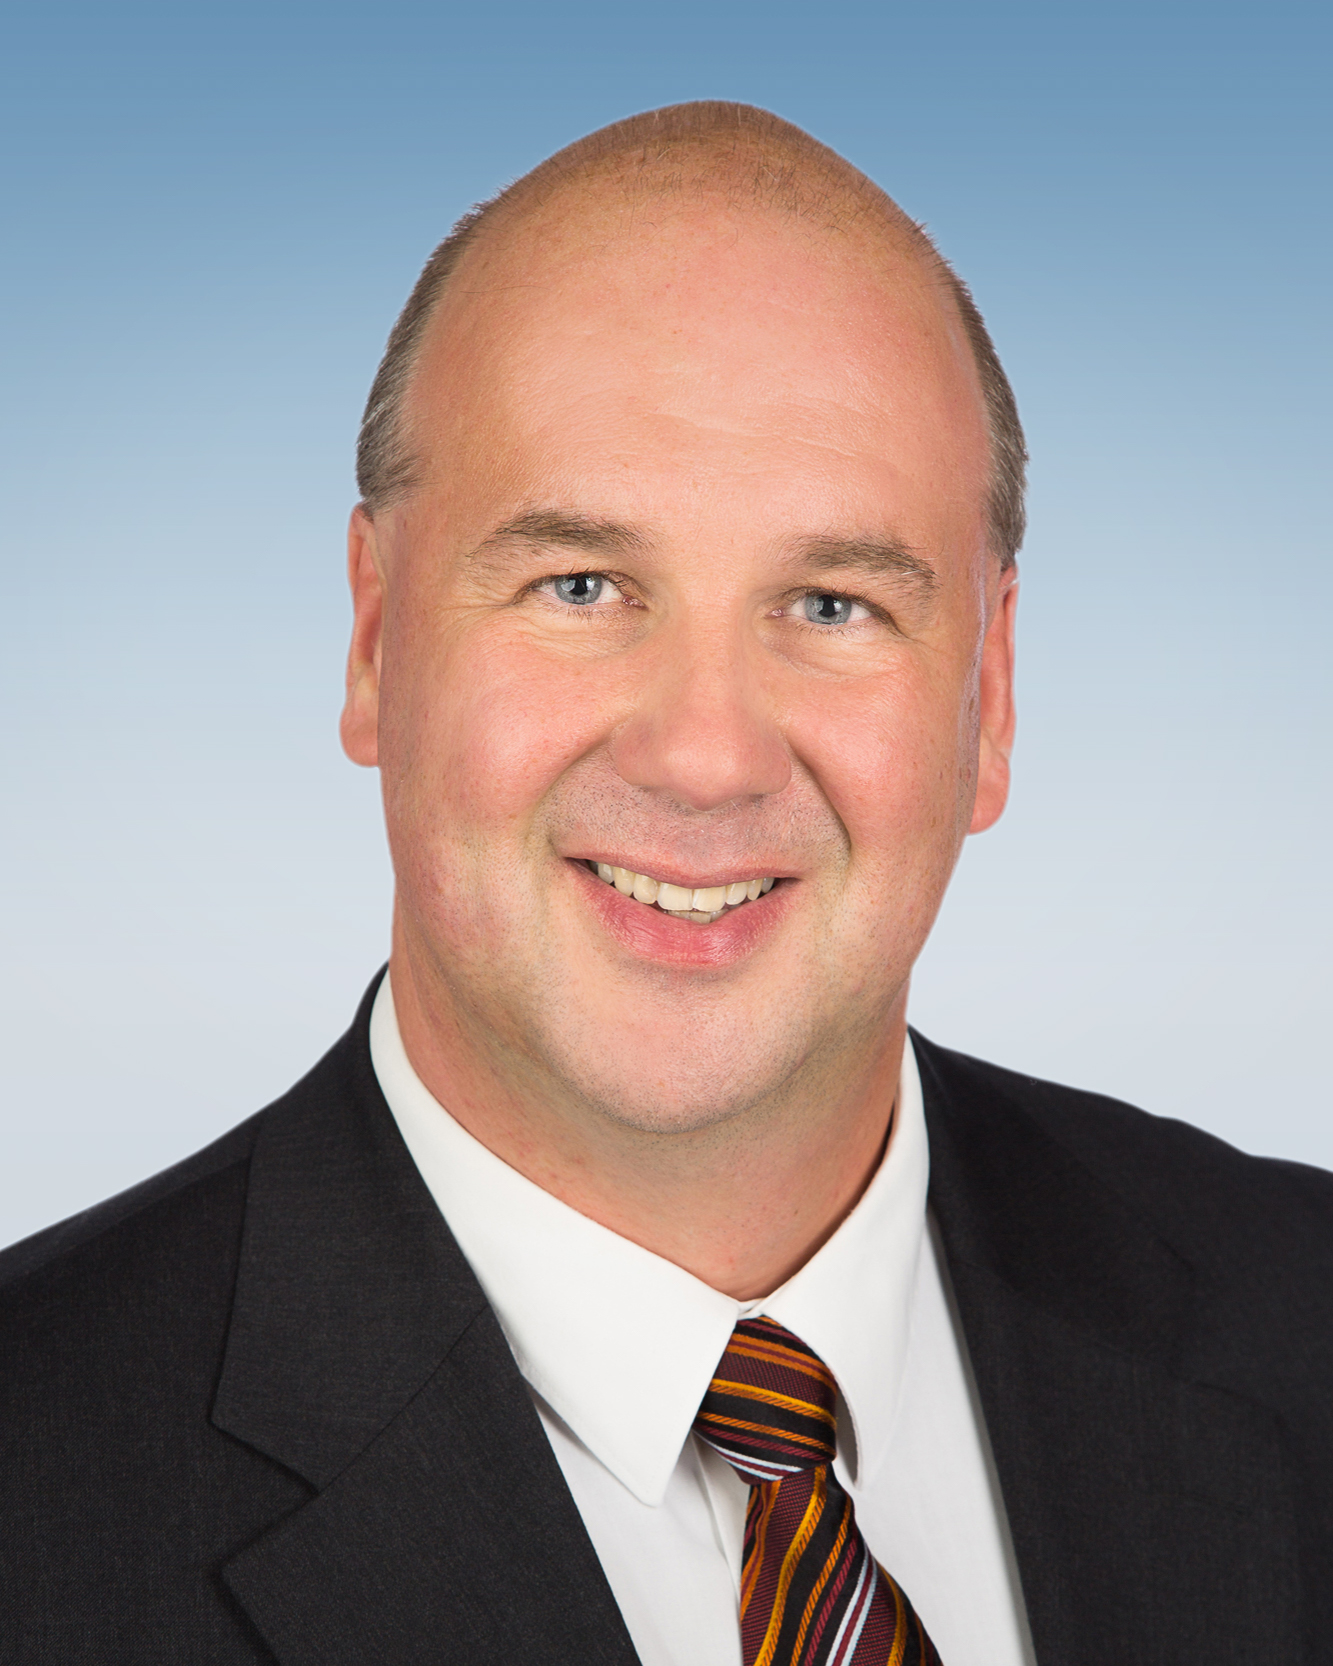 Ralf Meyran